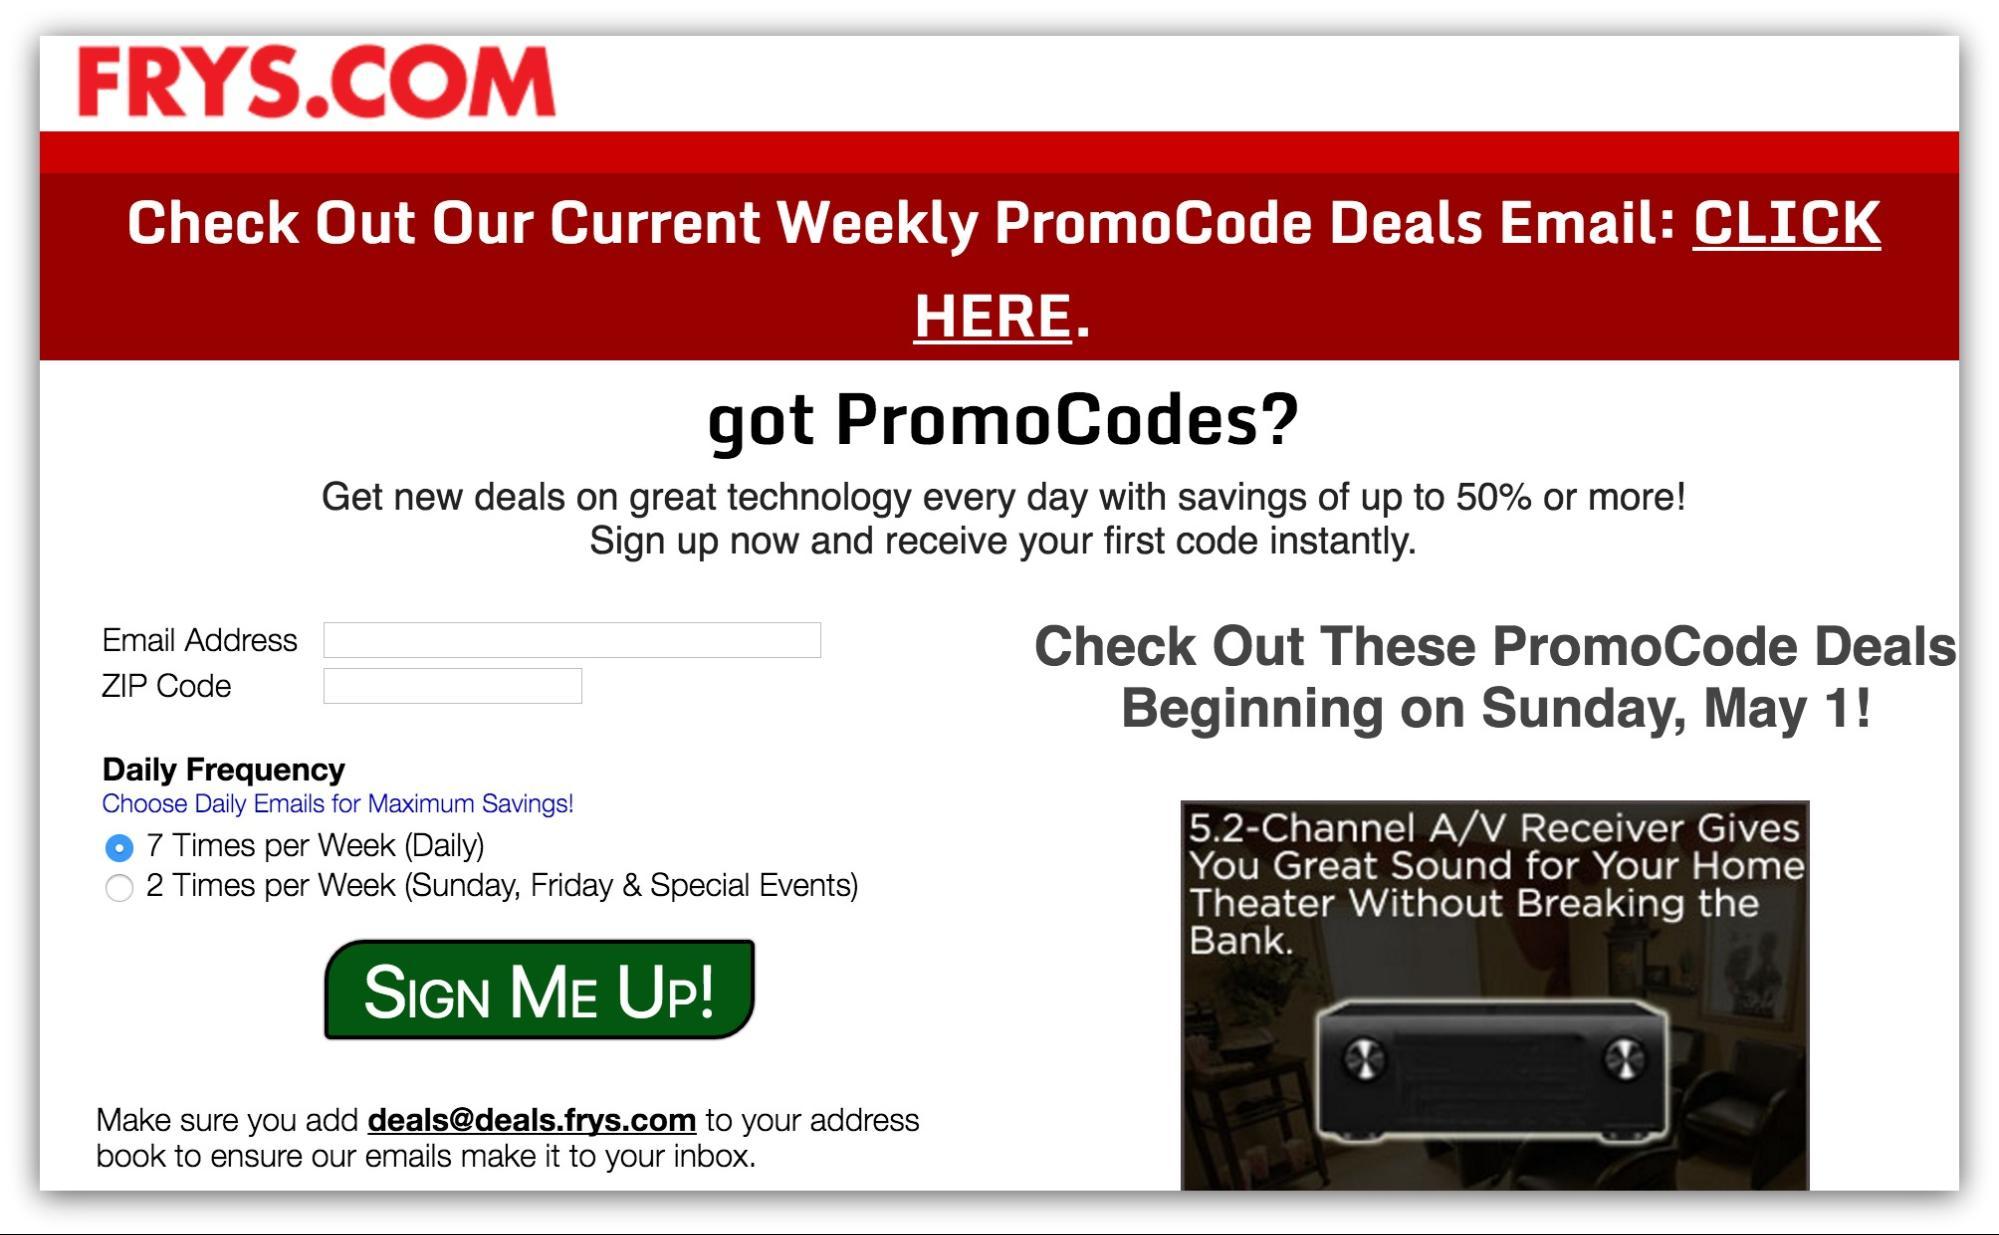 subscriber-only-deals-newsletter-list-building